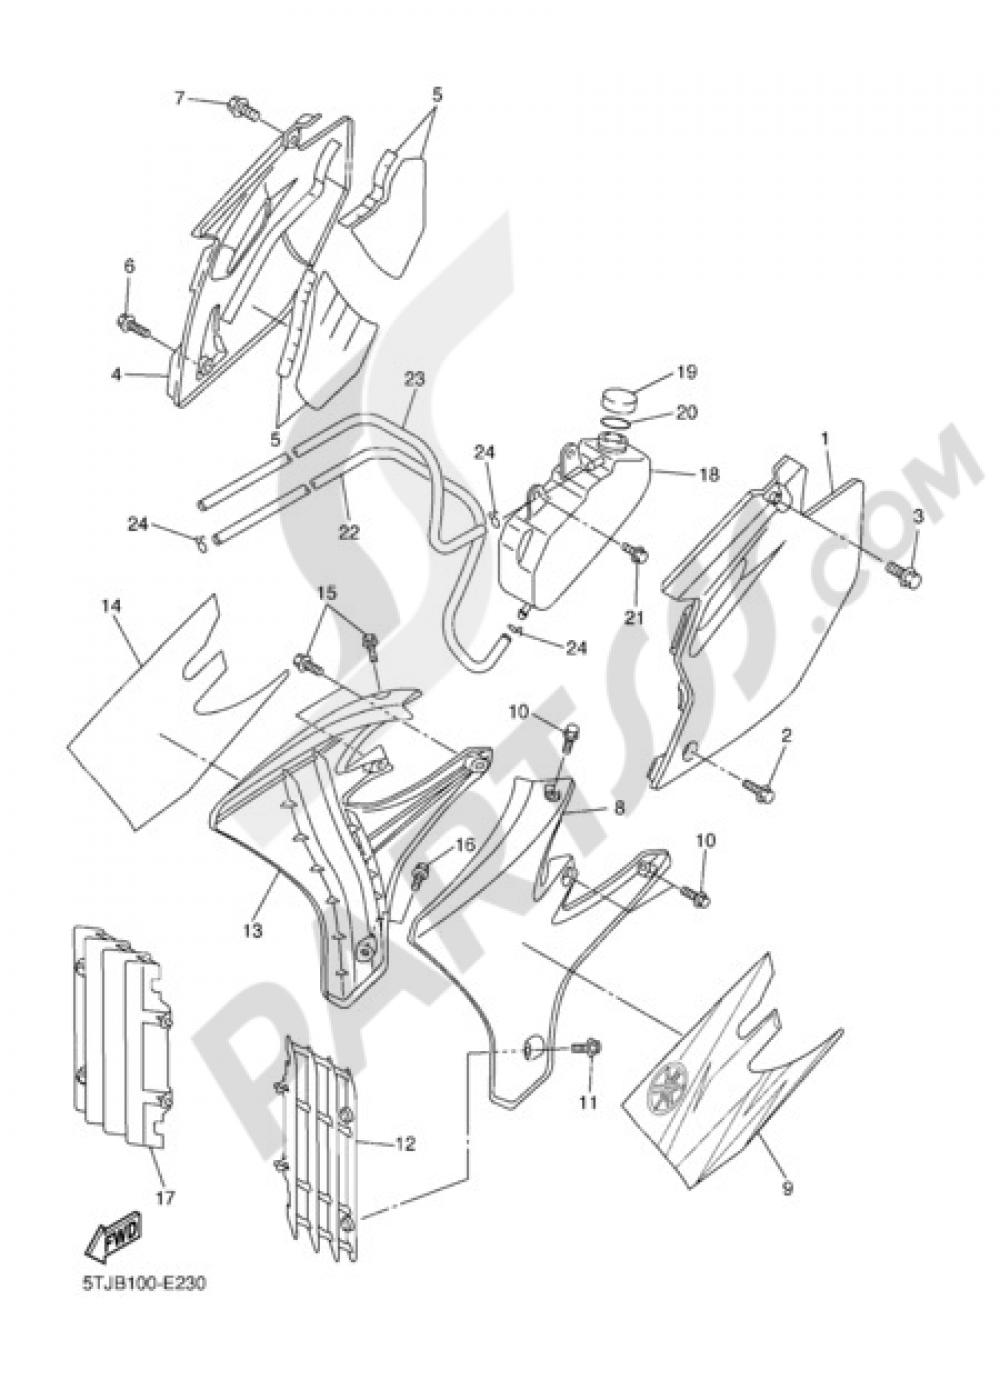 SIDE COVER Yamaha WR450F 2006